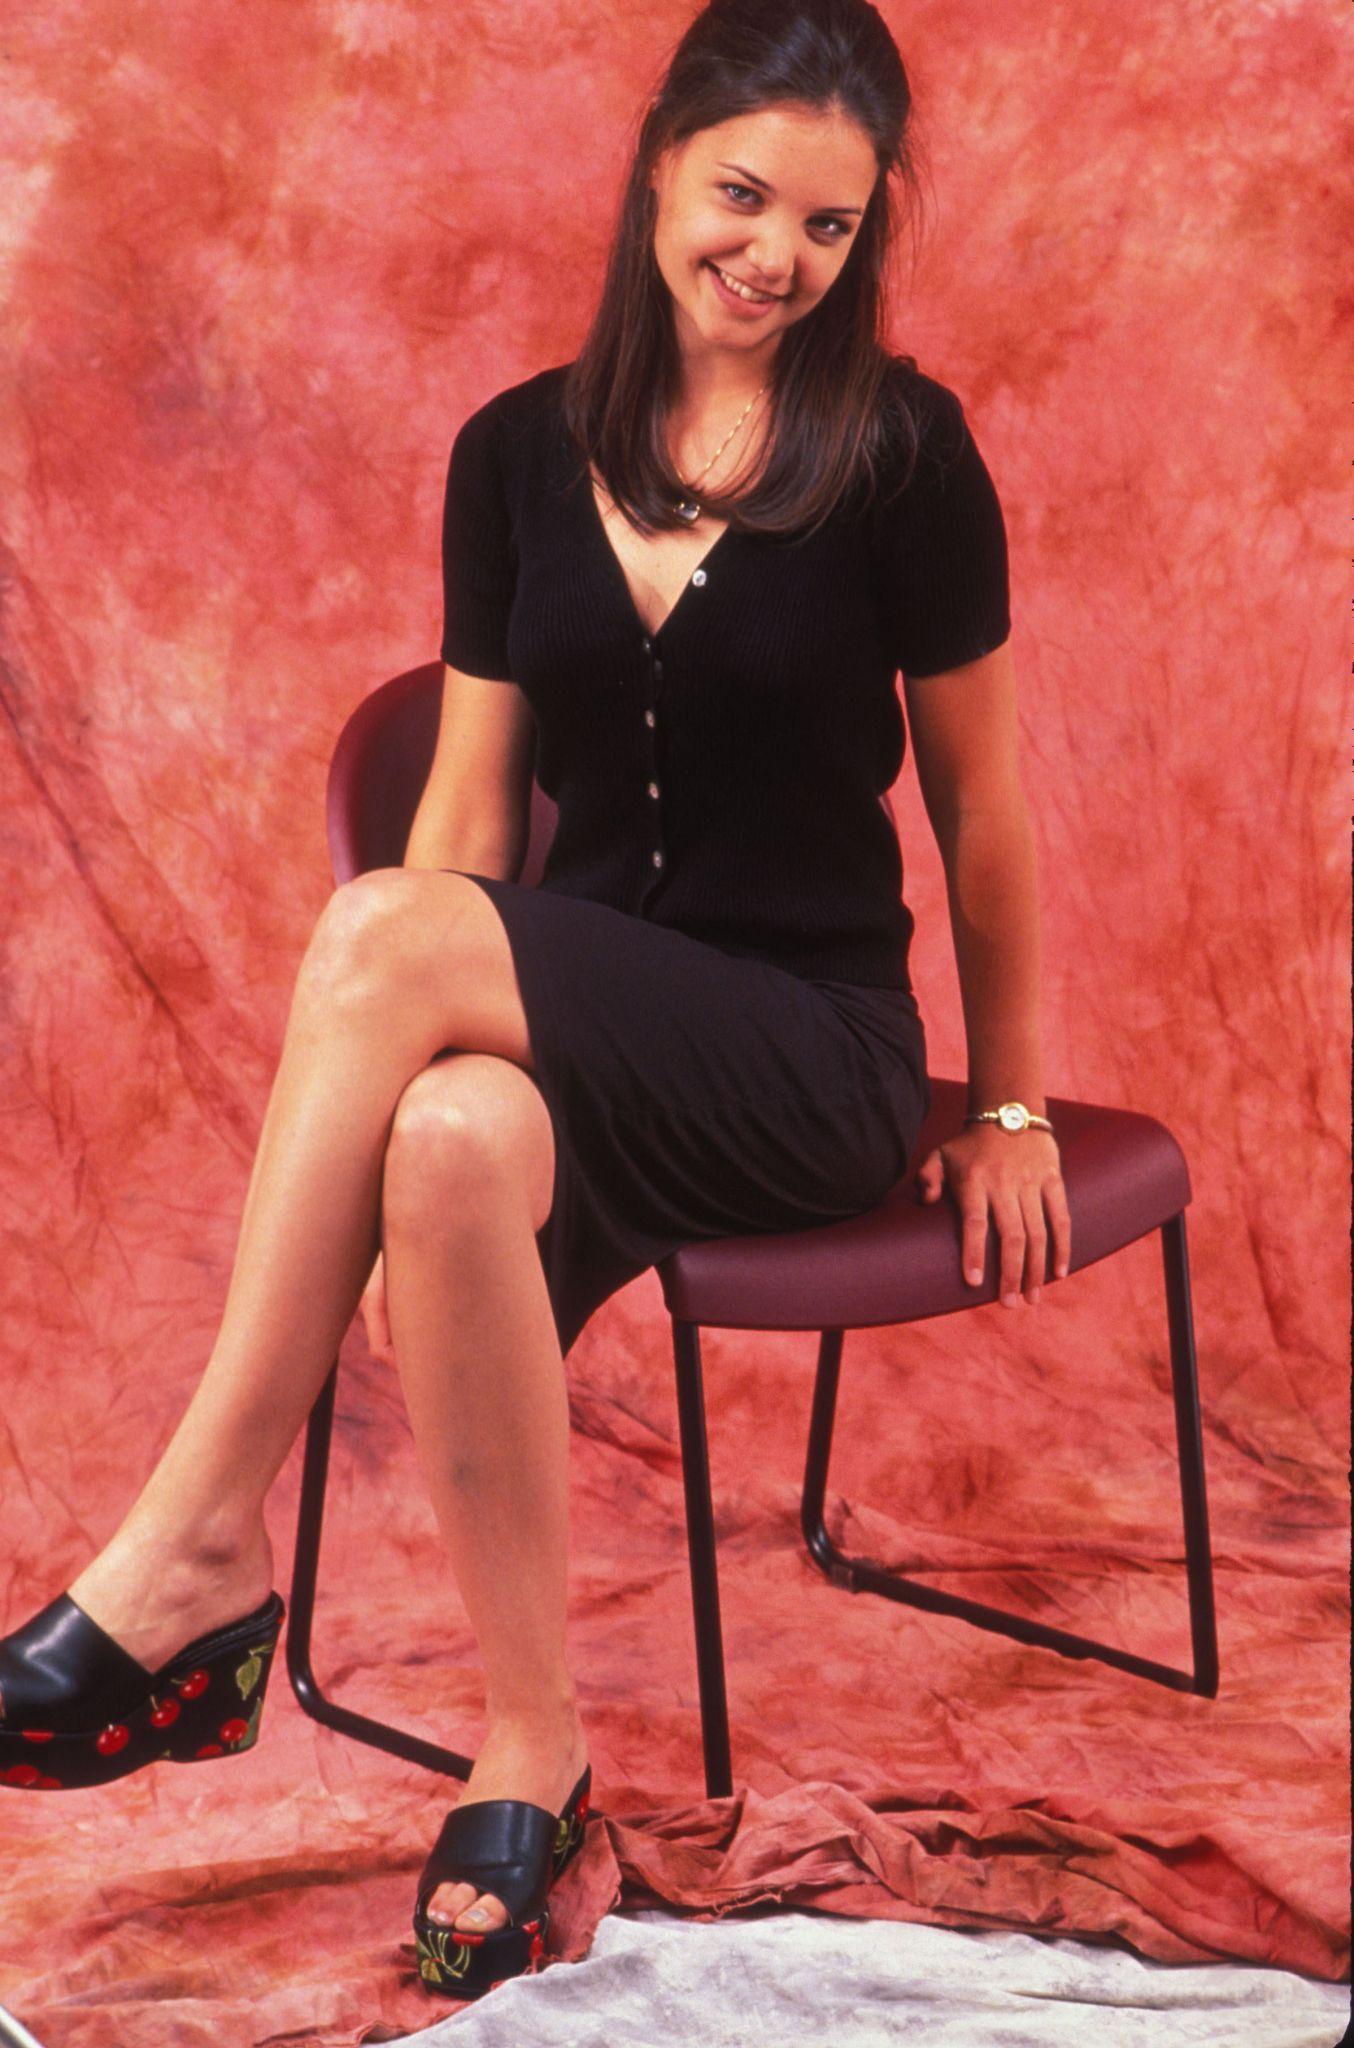 Katie Holmes Feet 743555jpg 13542048 Katie Holmes